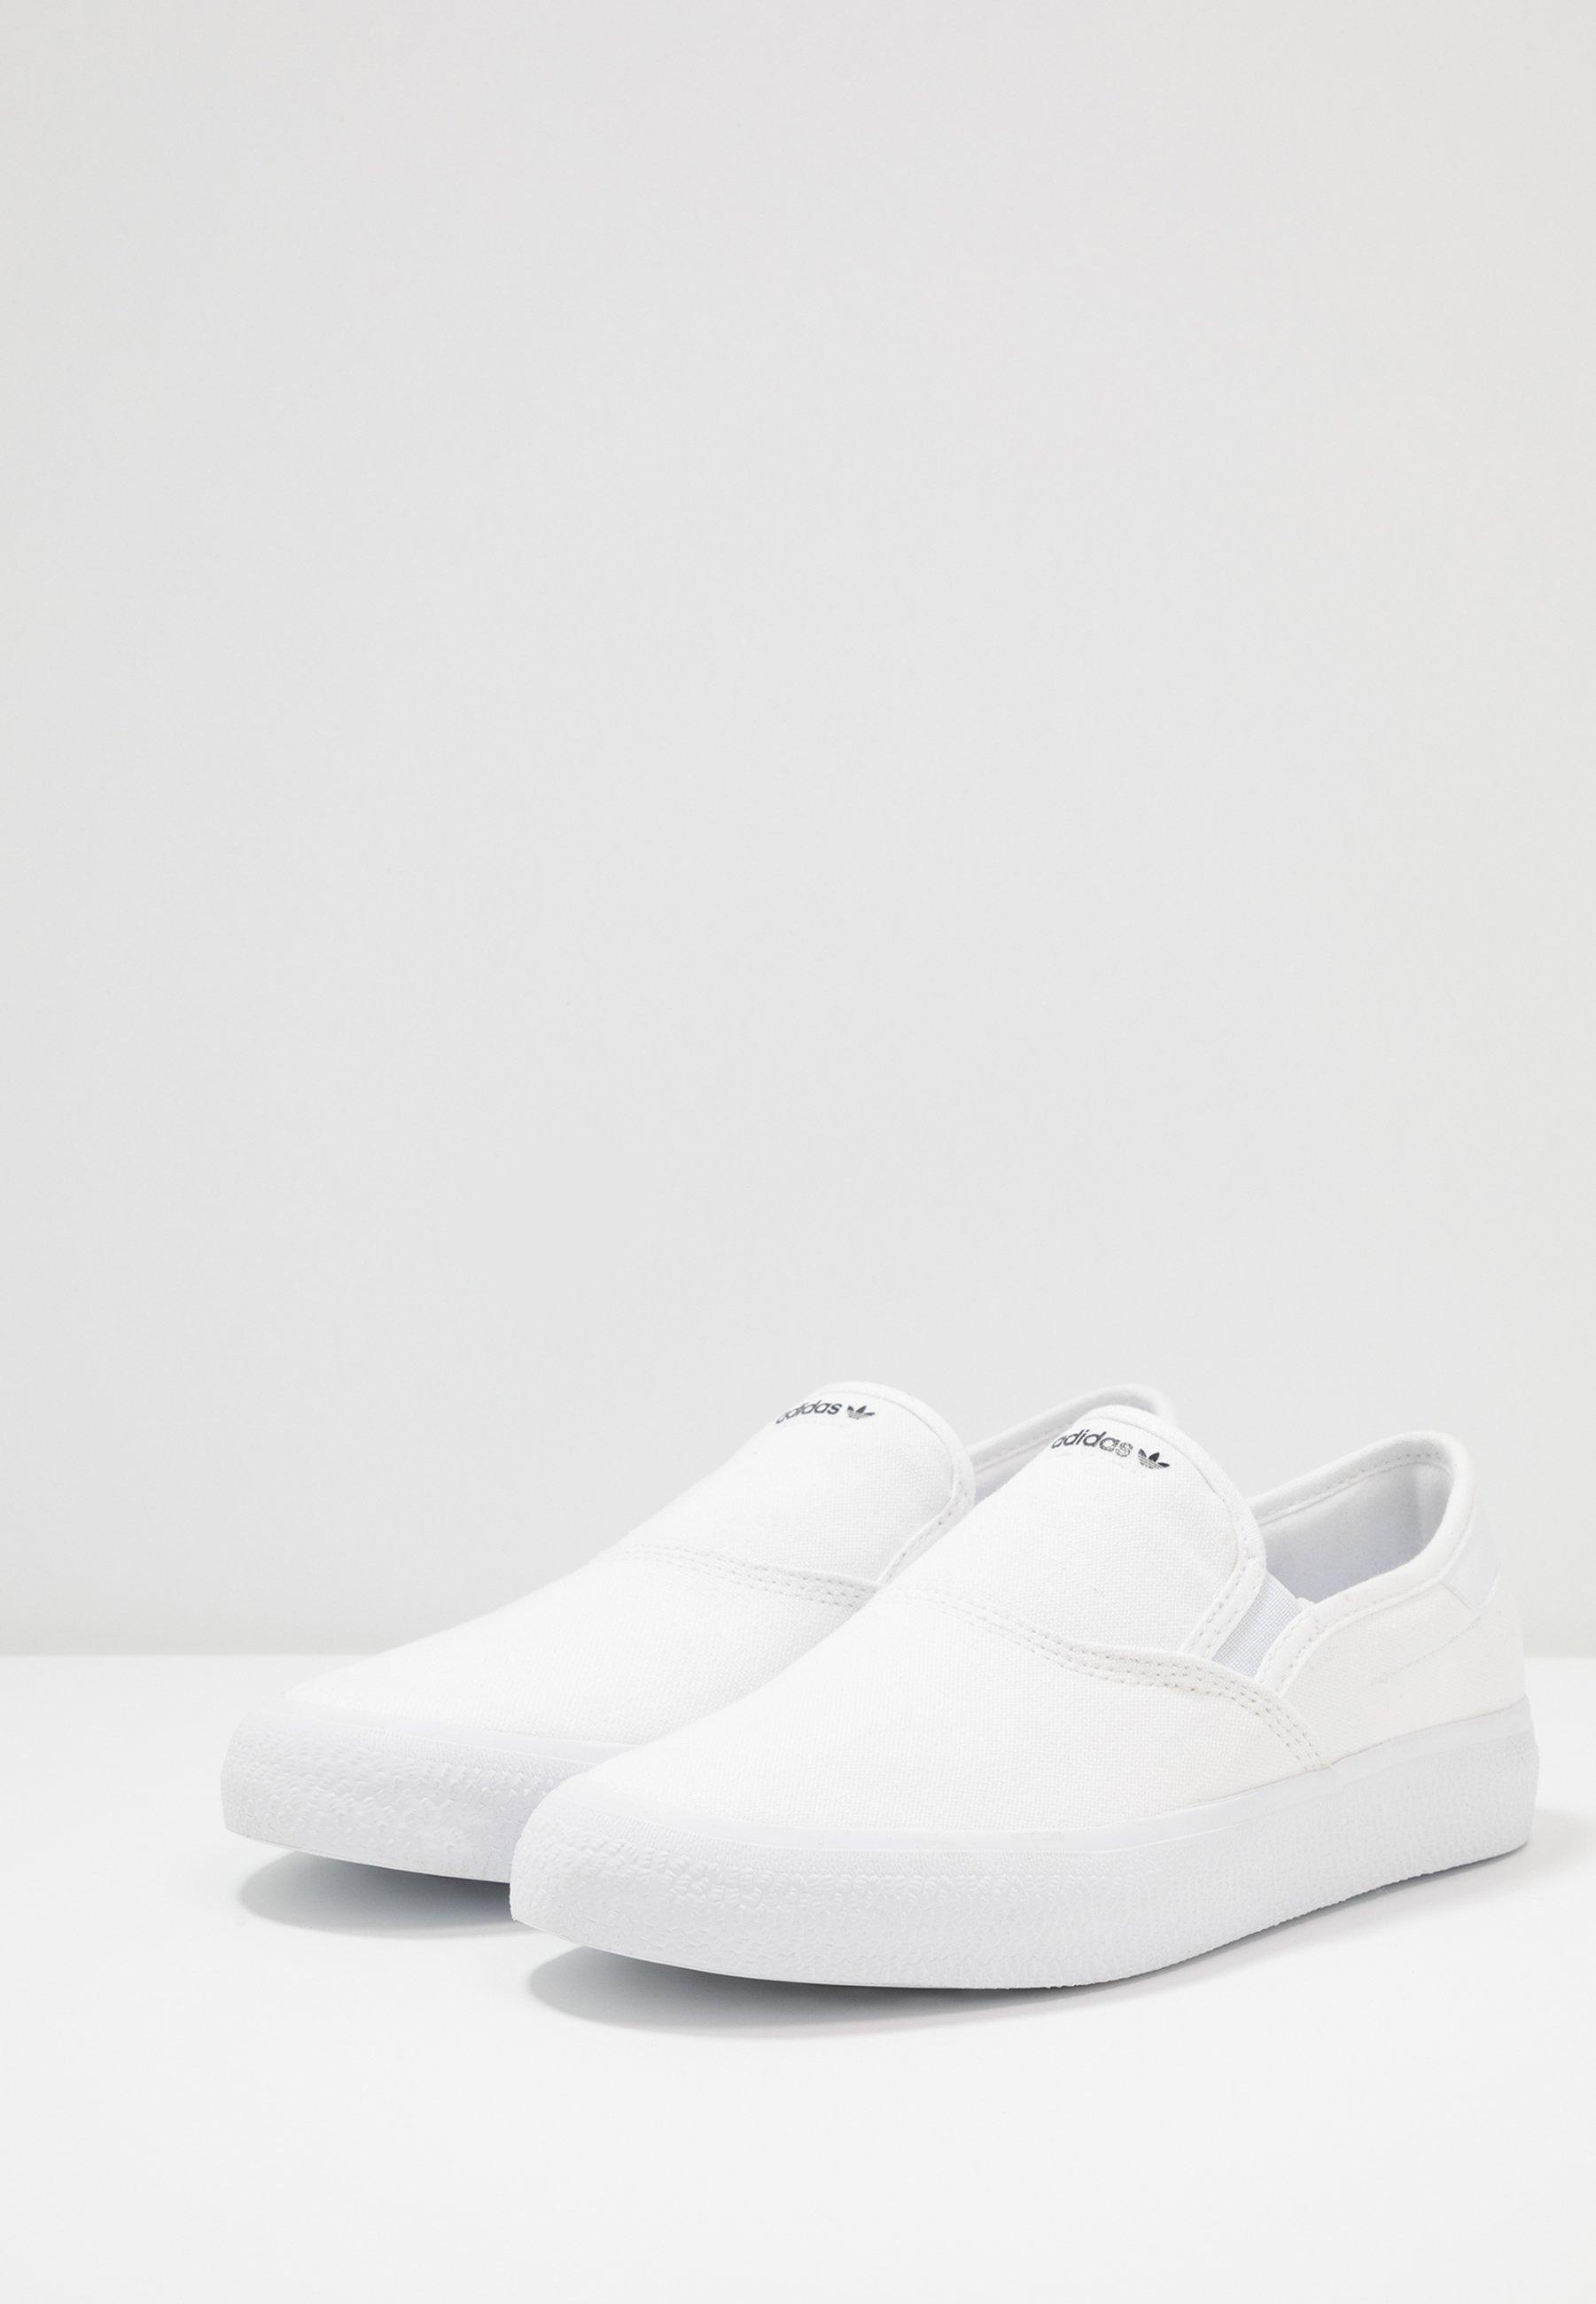 adidas Originals 3MC - Mocassins - footwear white/core black - Mocassins & Chaussures bateau femme À bas prix